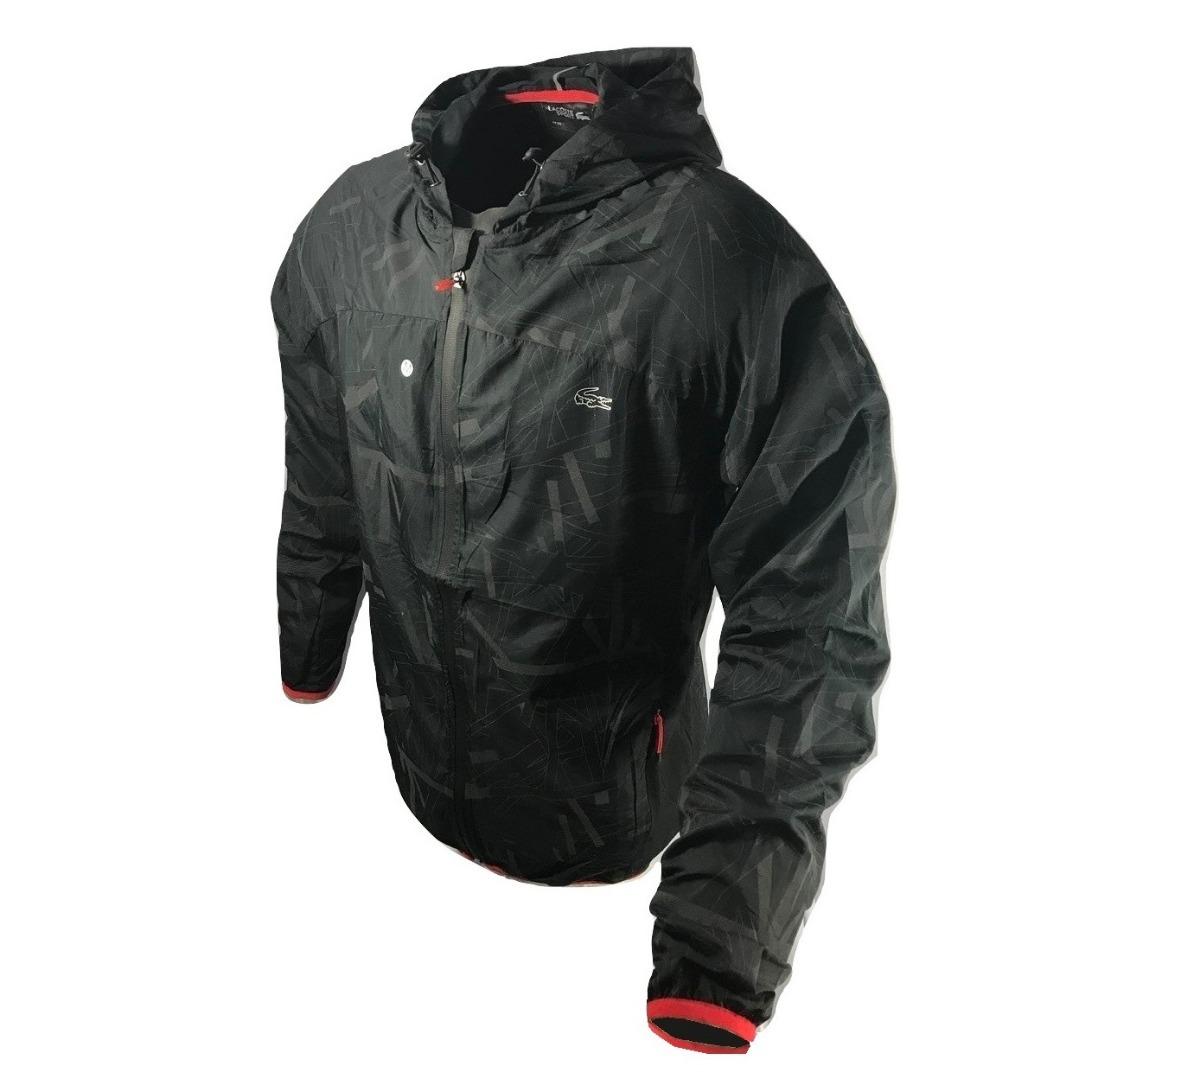 0ce0b31988d jaqueta corta vento lacoste masculino refletiva impermeável. Carregando  zoom.